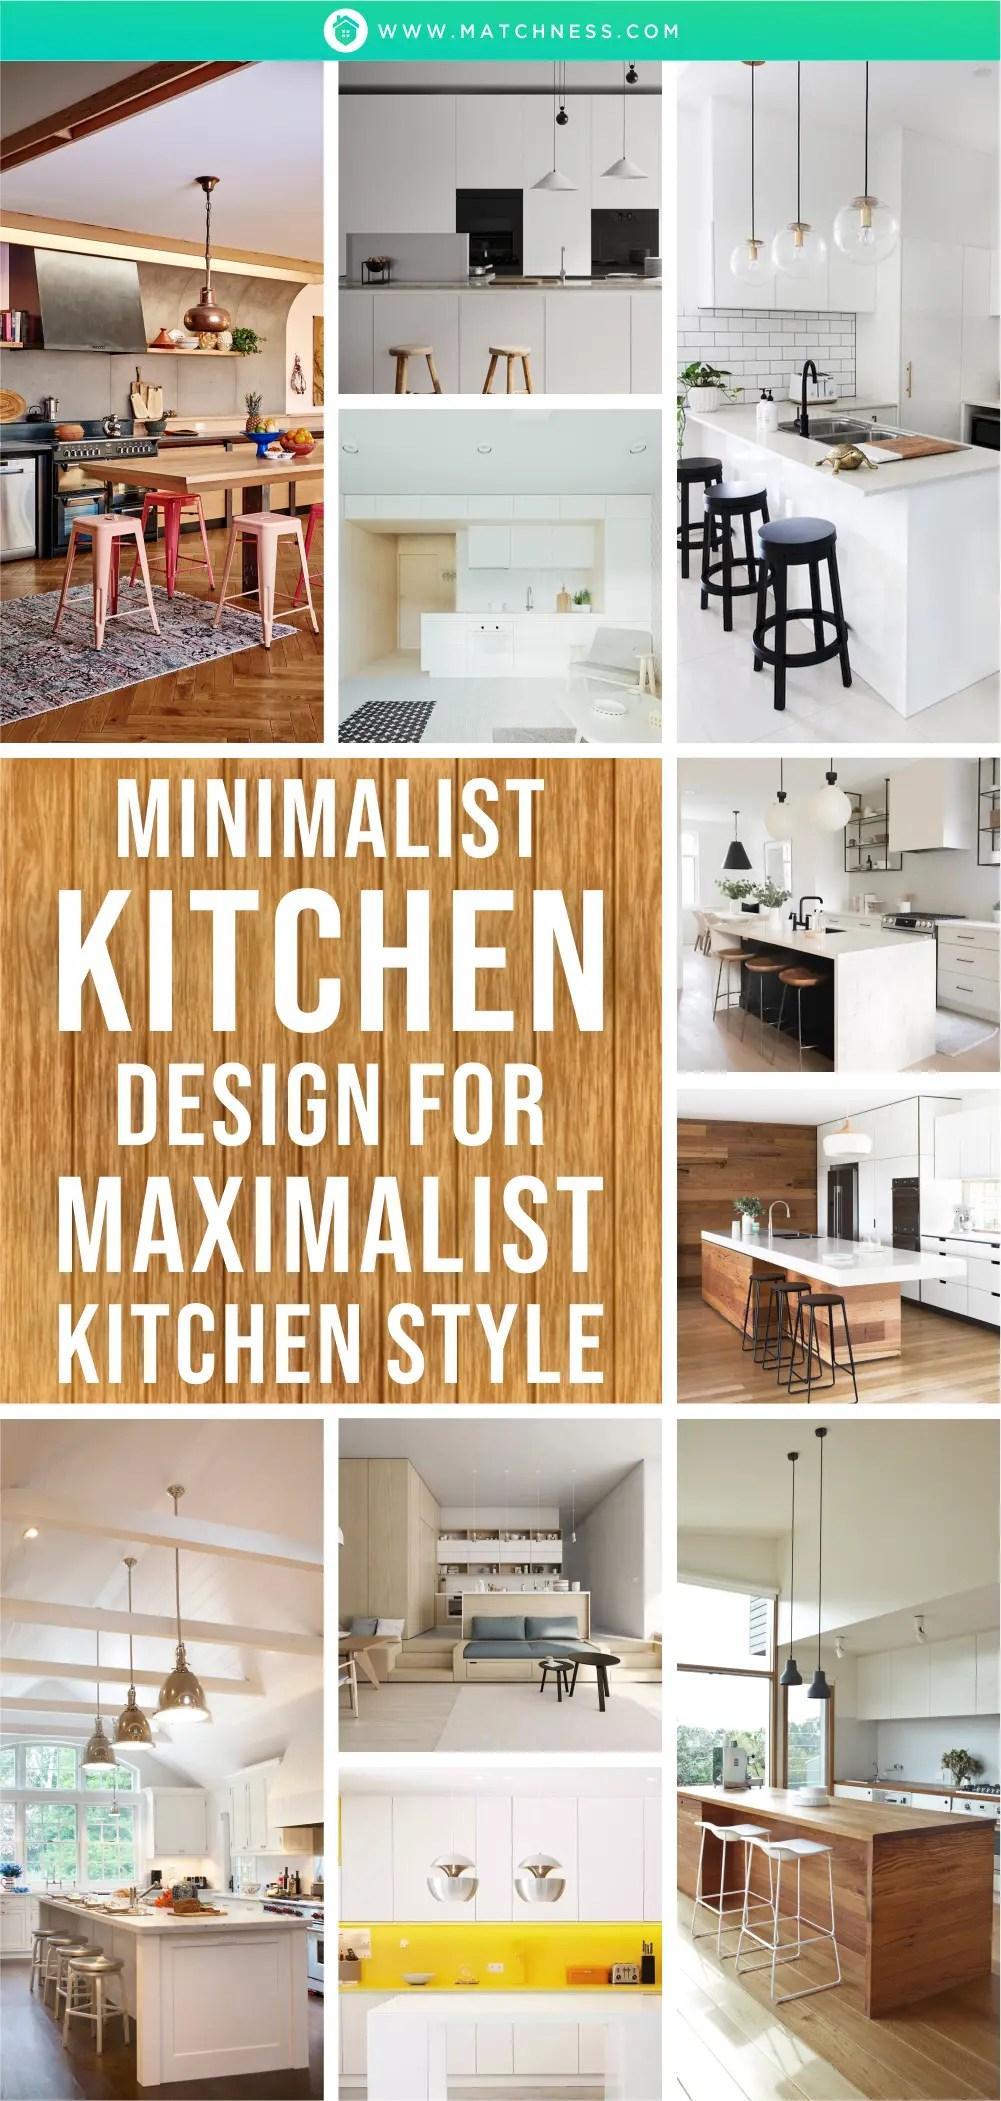 Cucina-design-minimalista-per-cucina-stile-massimalista-1